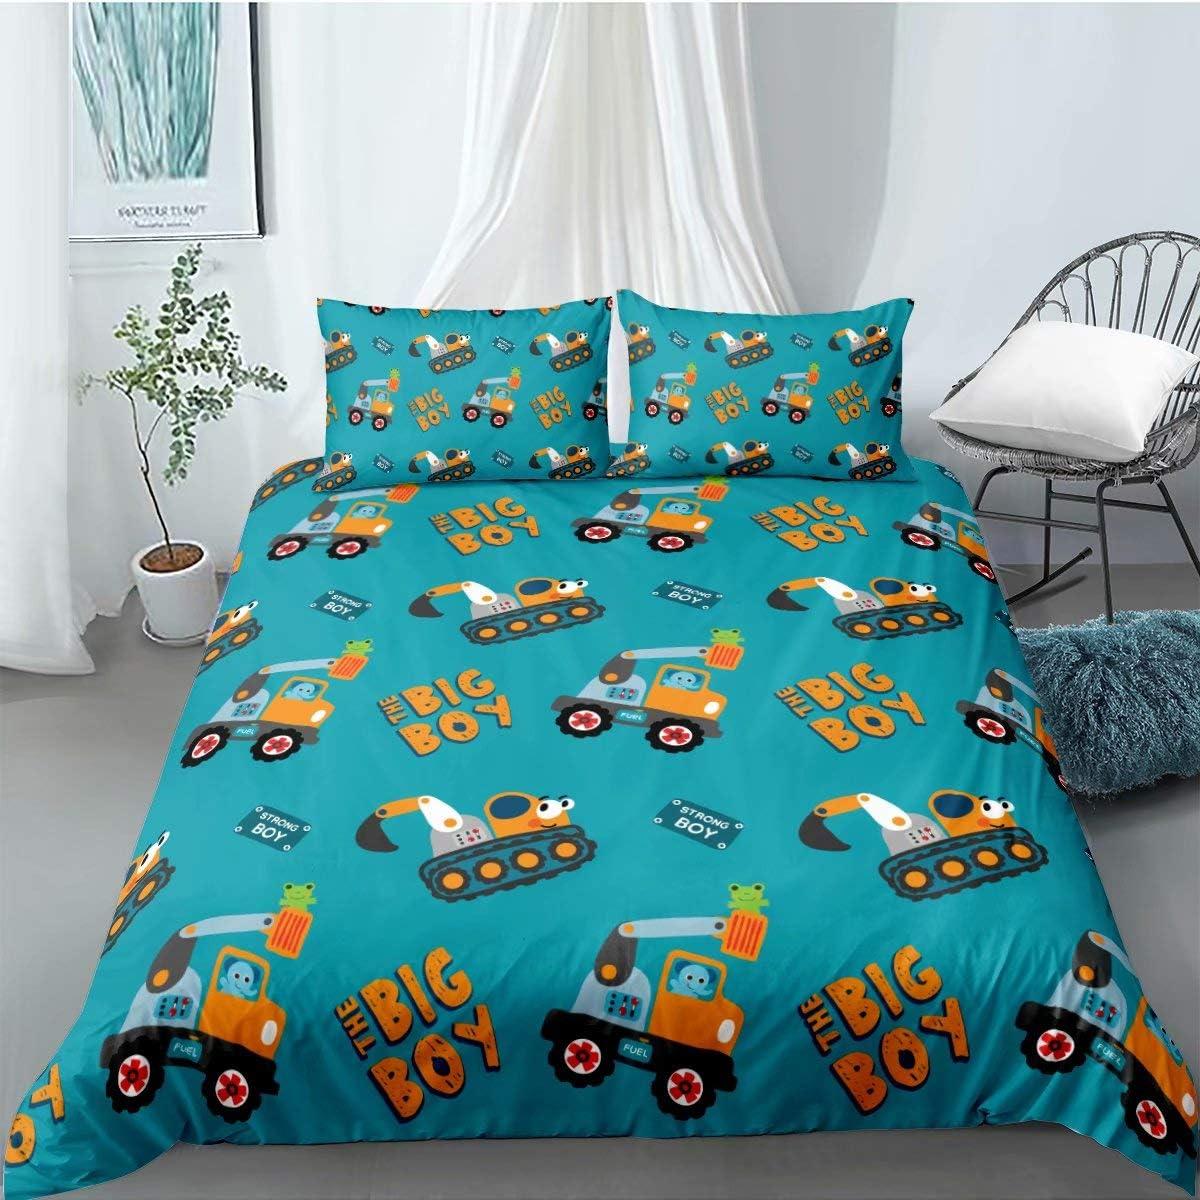 Car Duvet Cover Bedding 18%OFF Set 半額 Quilt Size 3Pcs Full